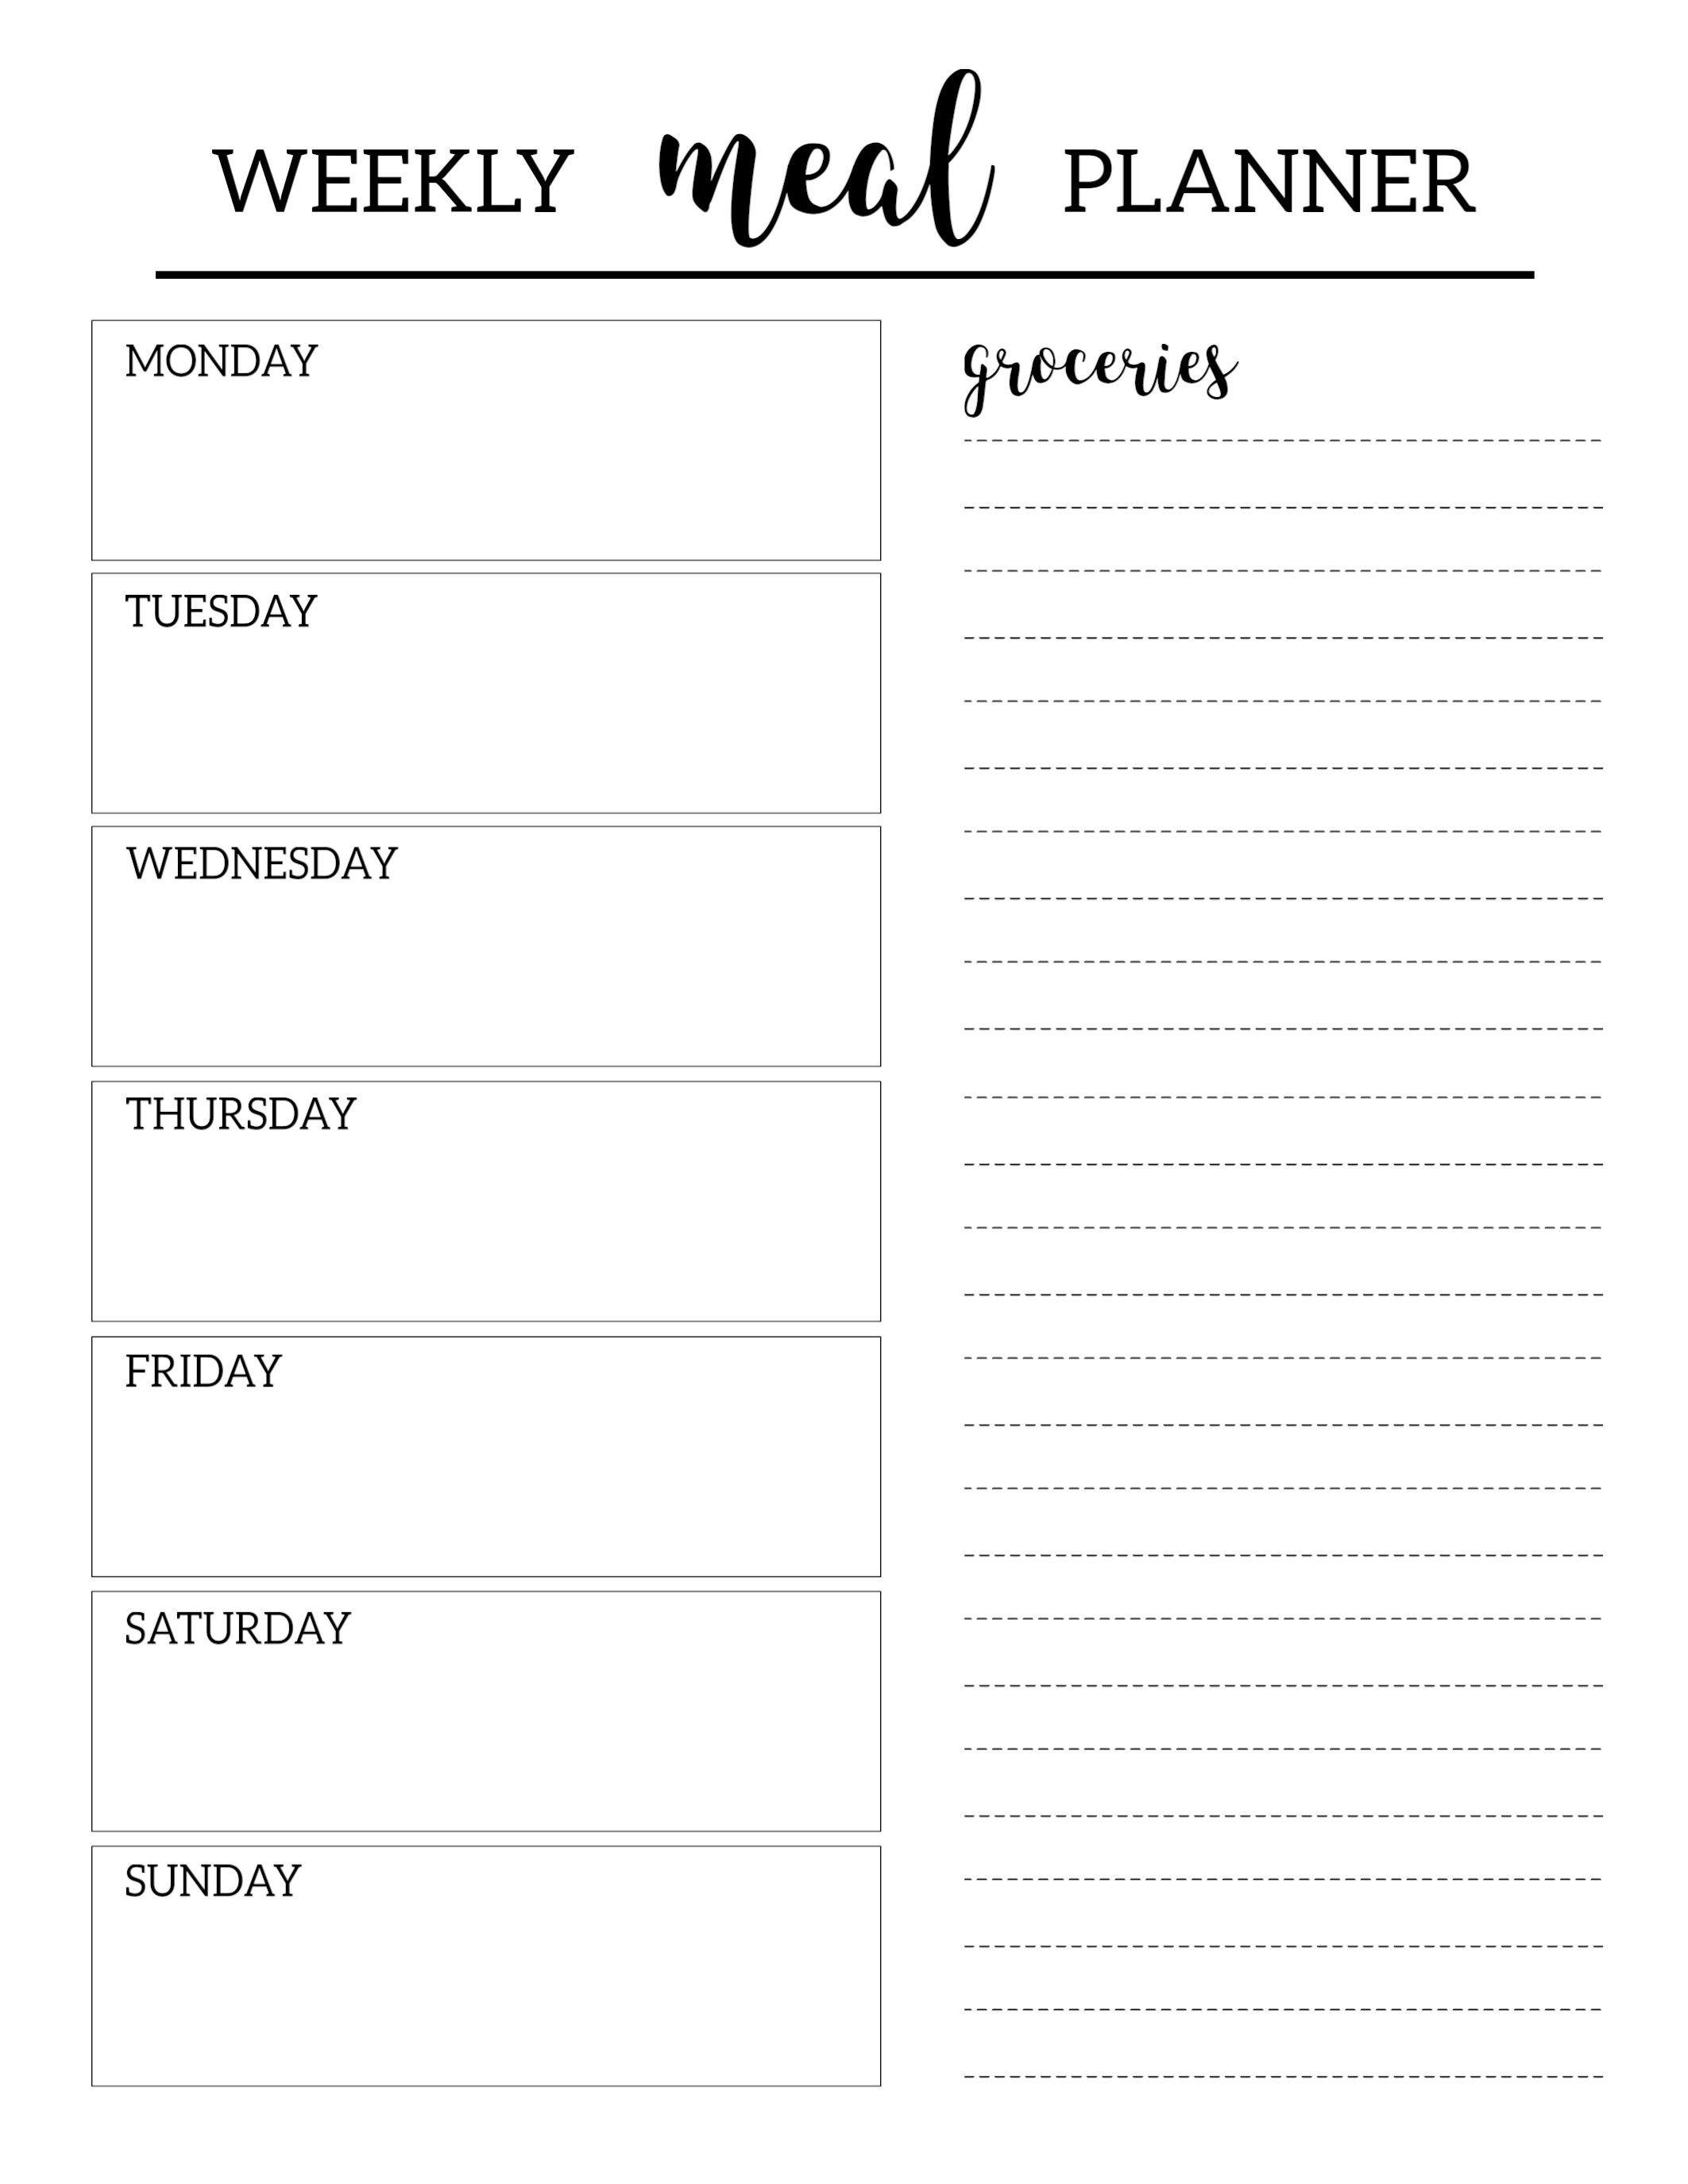 Free Printable Meal Planner Template  Organization  Meal Planner Intended For Weekly Menu Planner Template Word